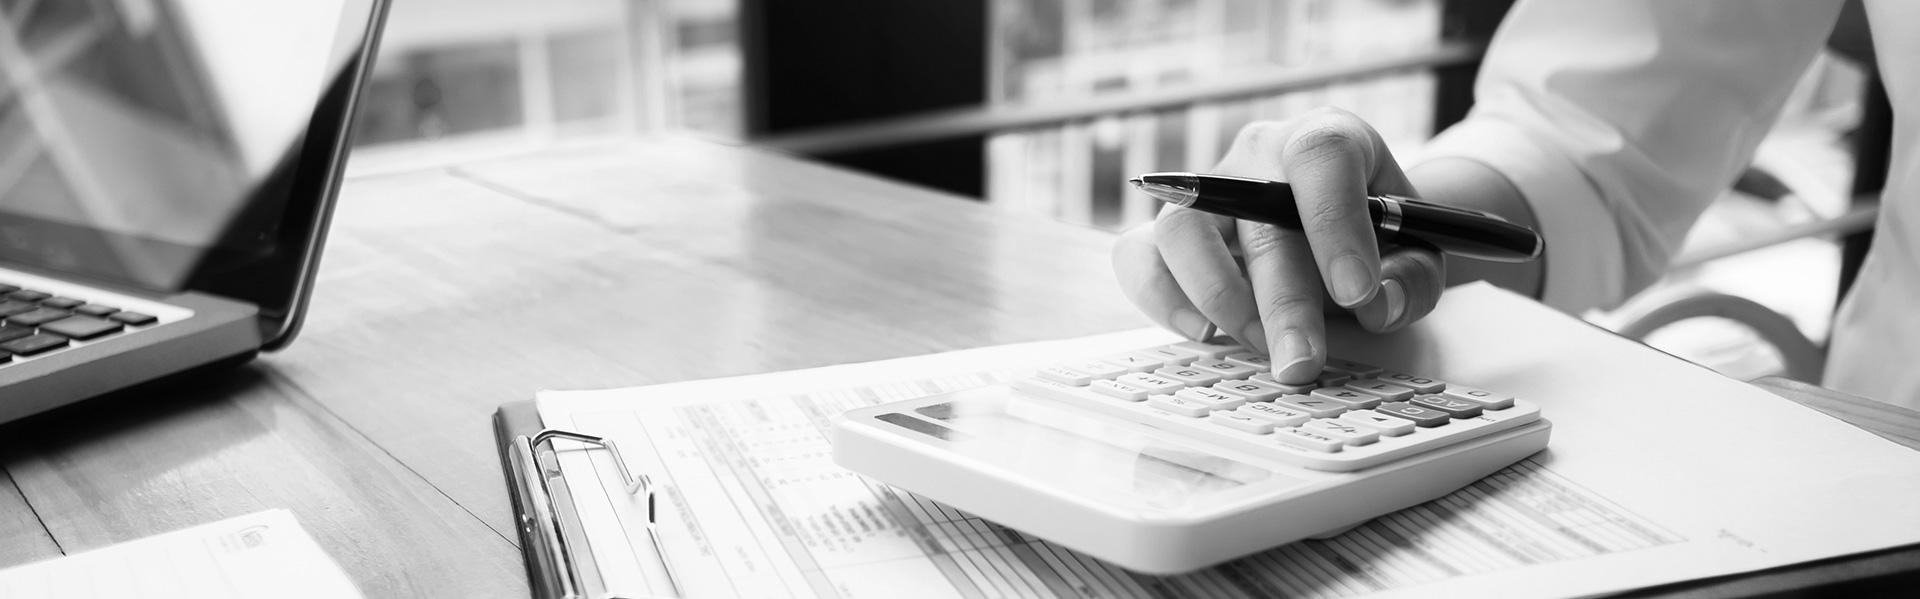 hoa-accounting-services.jpg